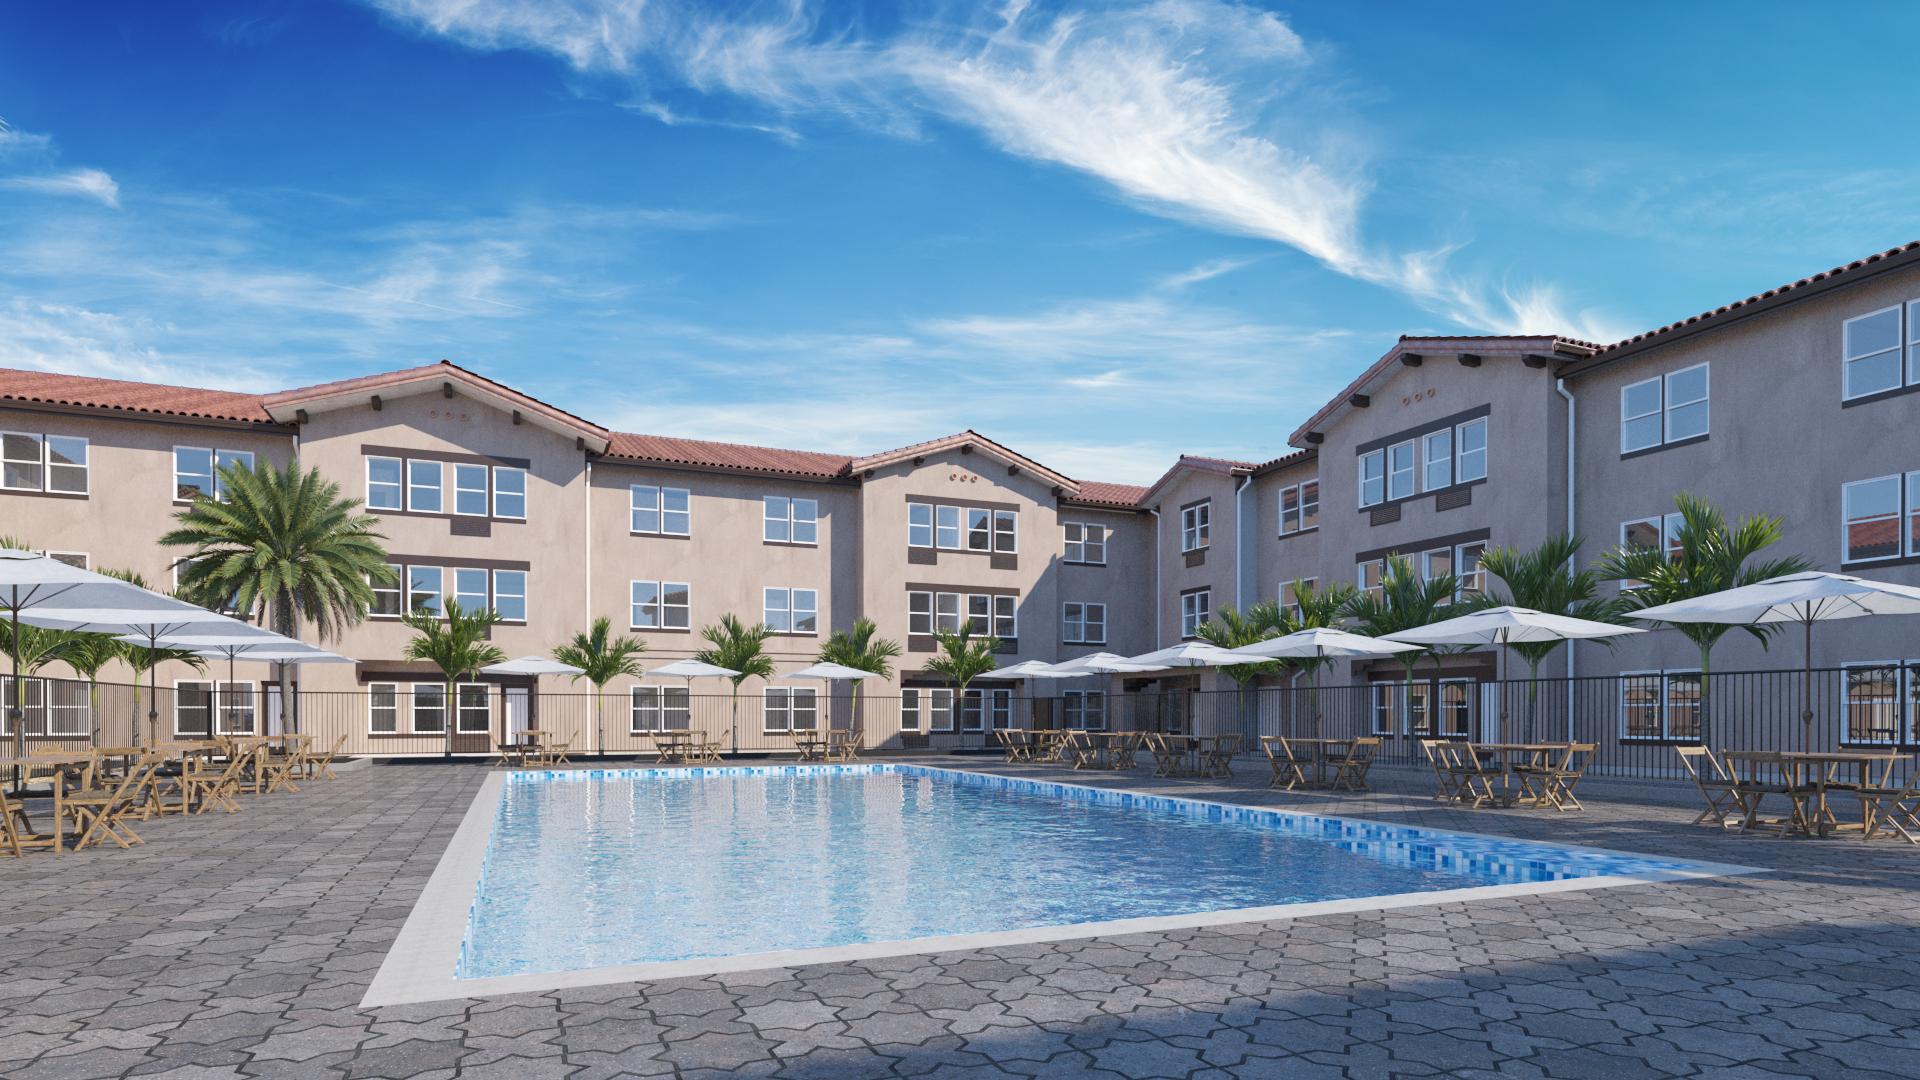 Link Senior Development and MedCore Partners Announce Development of 202-Unit Senior Living Community in Buckeye, Arizona